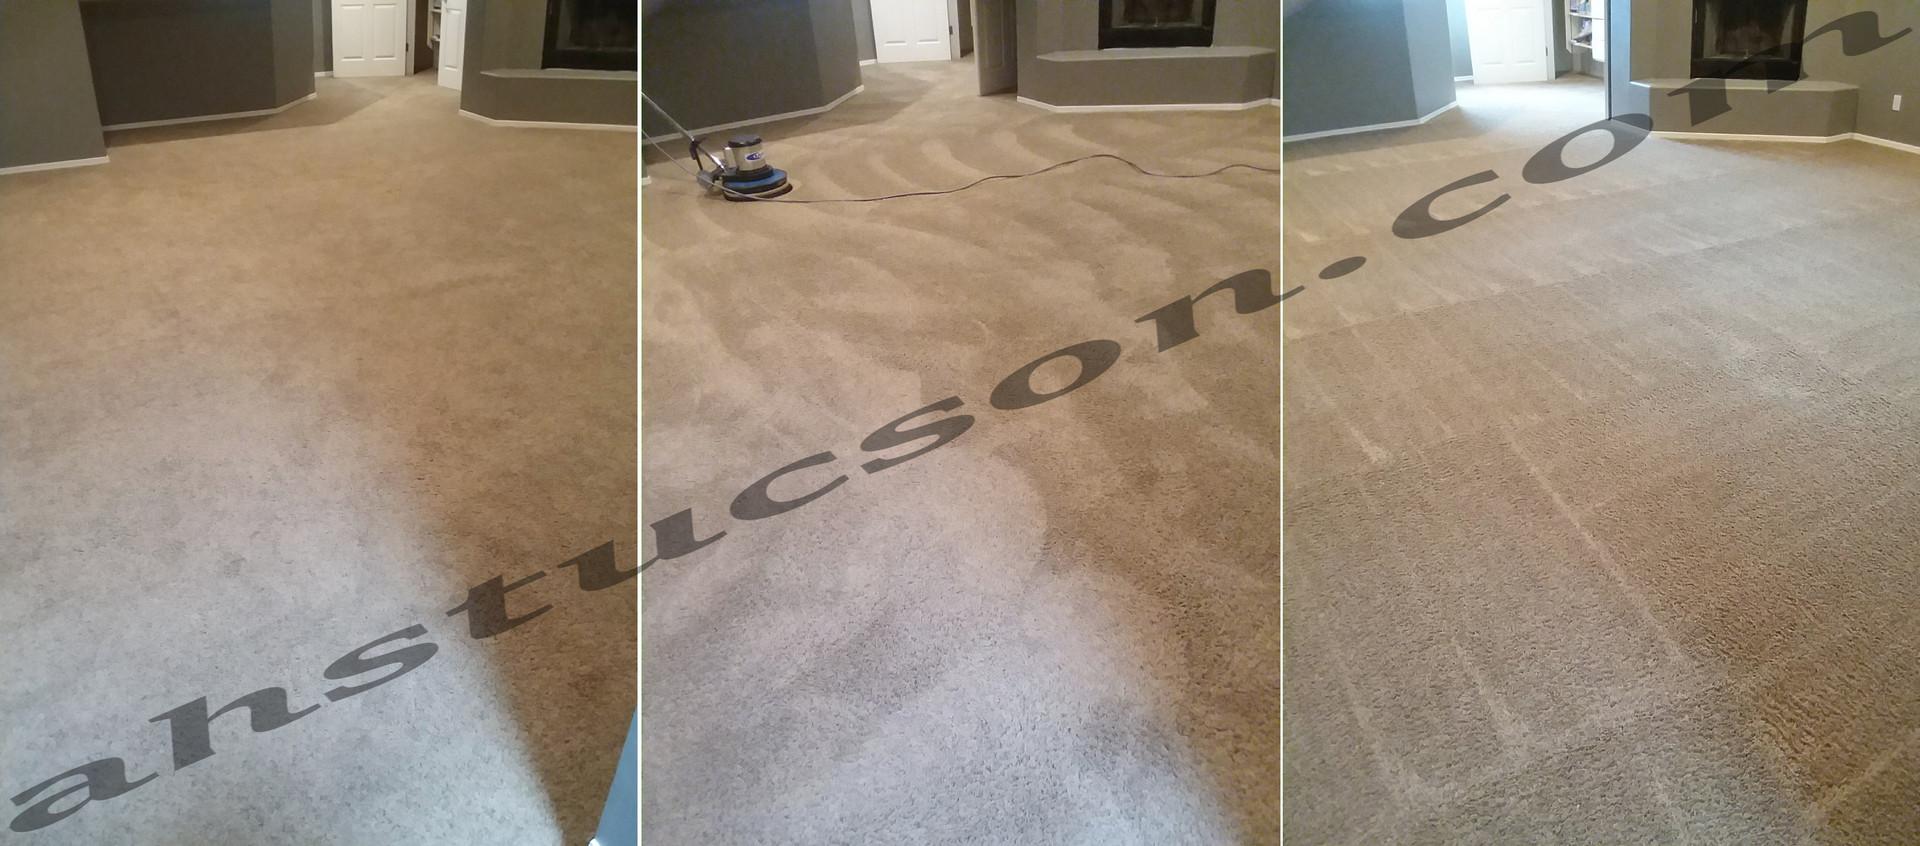 carpet-cleaning-20180404_161208.jpg